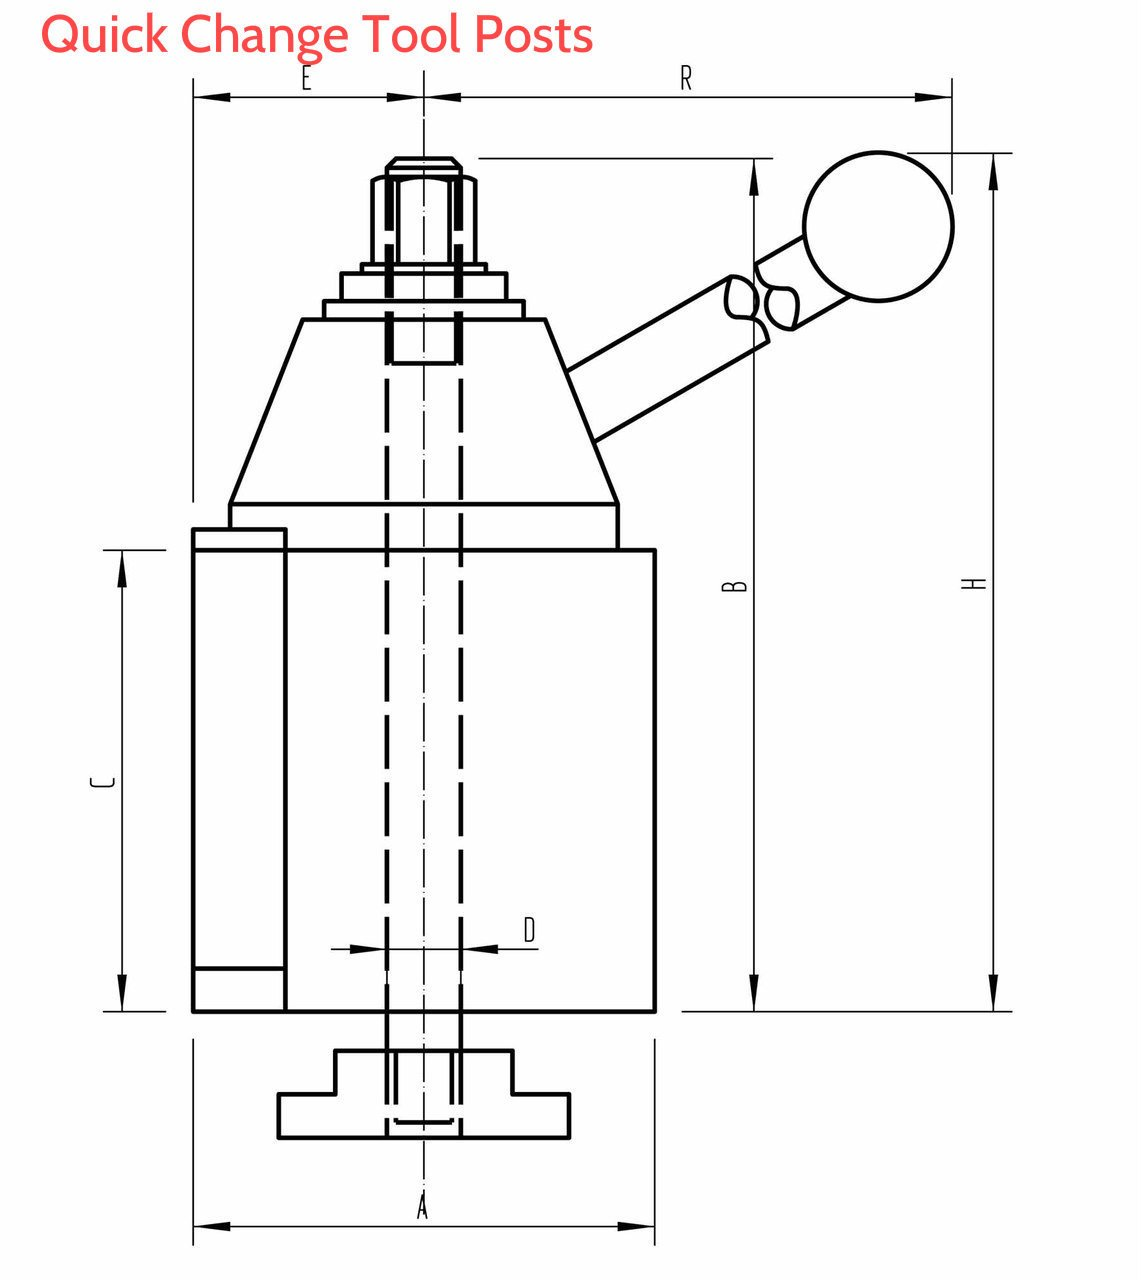 Accusize Tools - for Lathe Swing 6-12'', AXA, Wedge Type Quick Change Tool Post, 0250-0111